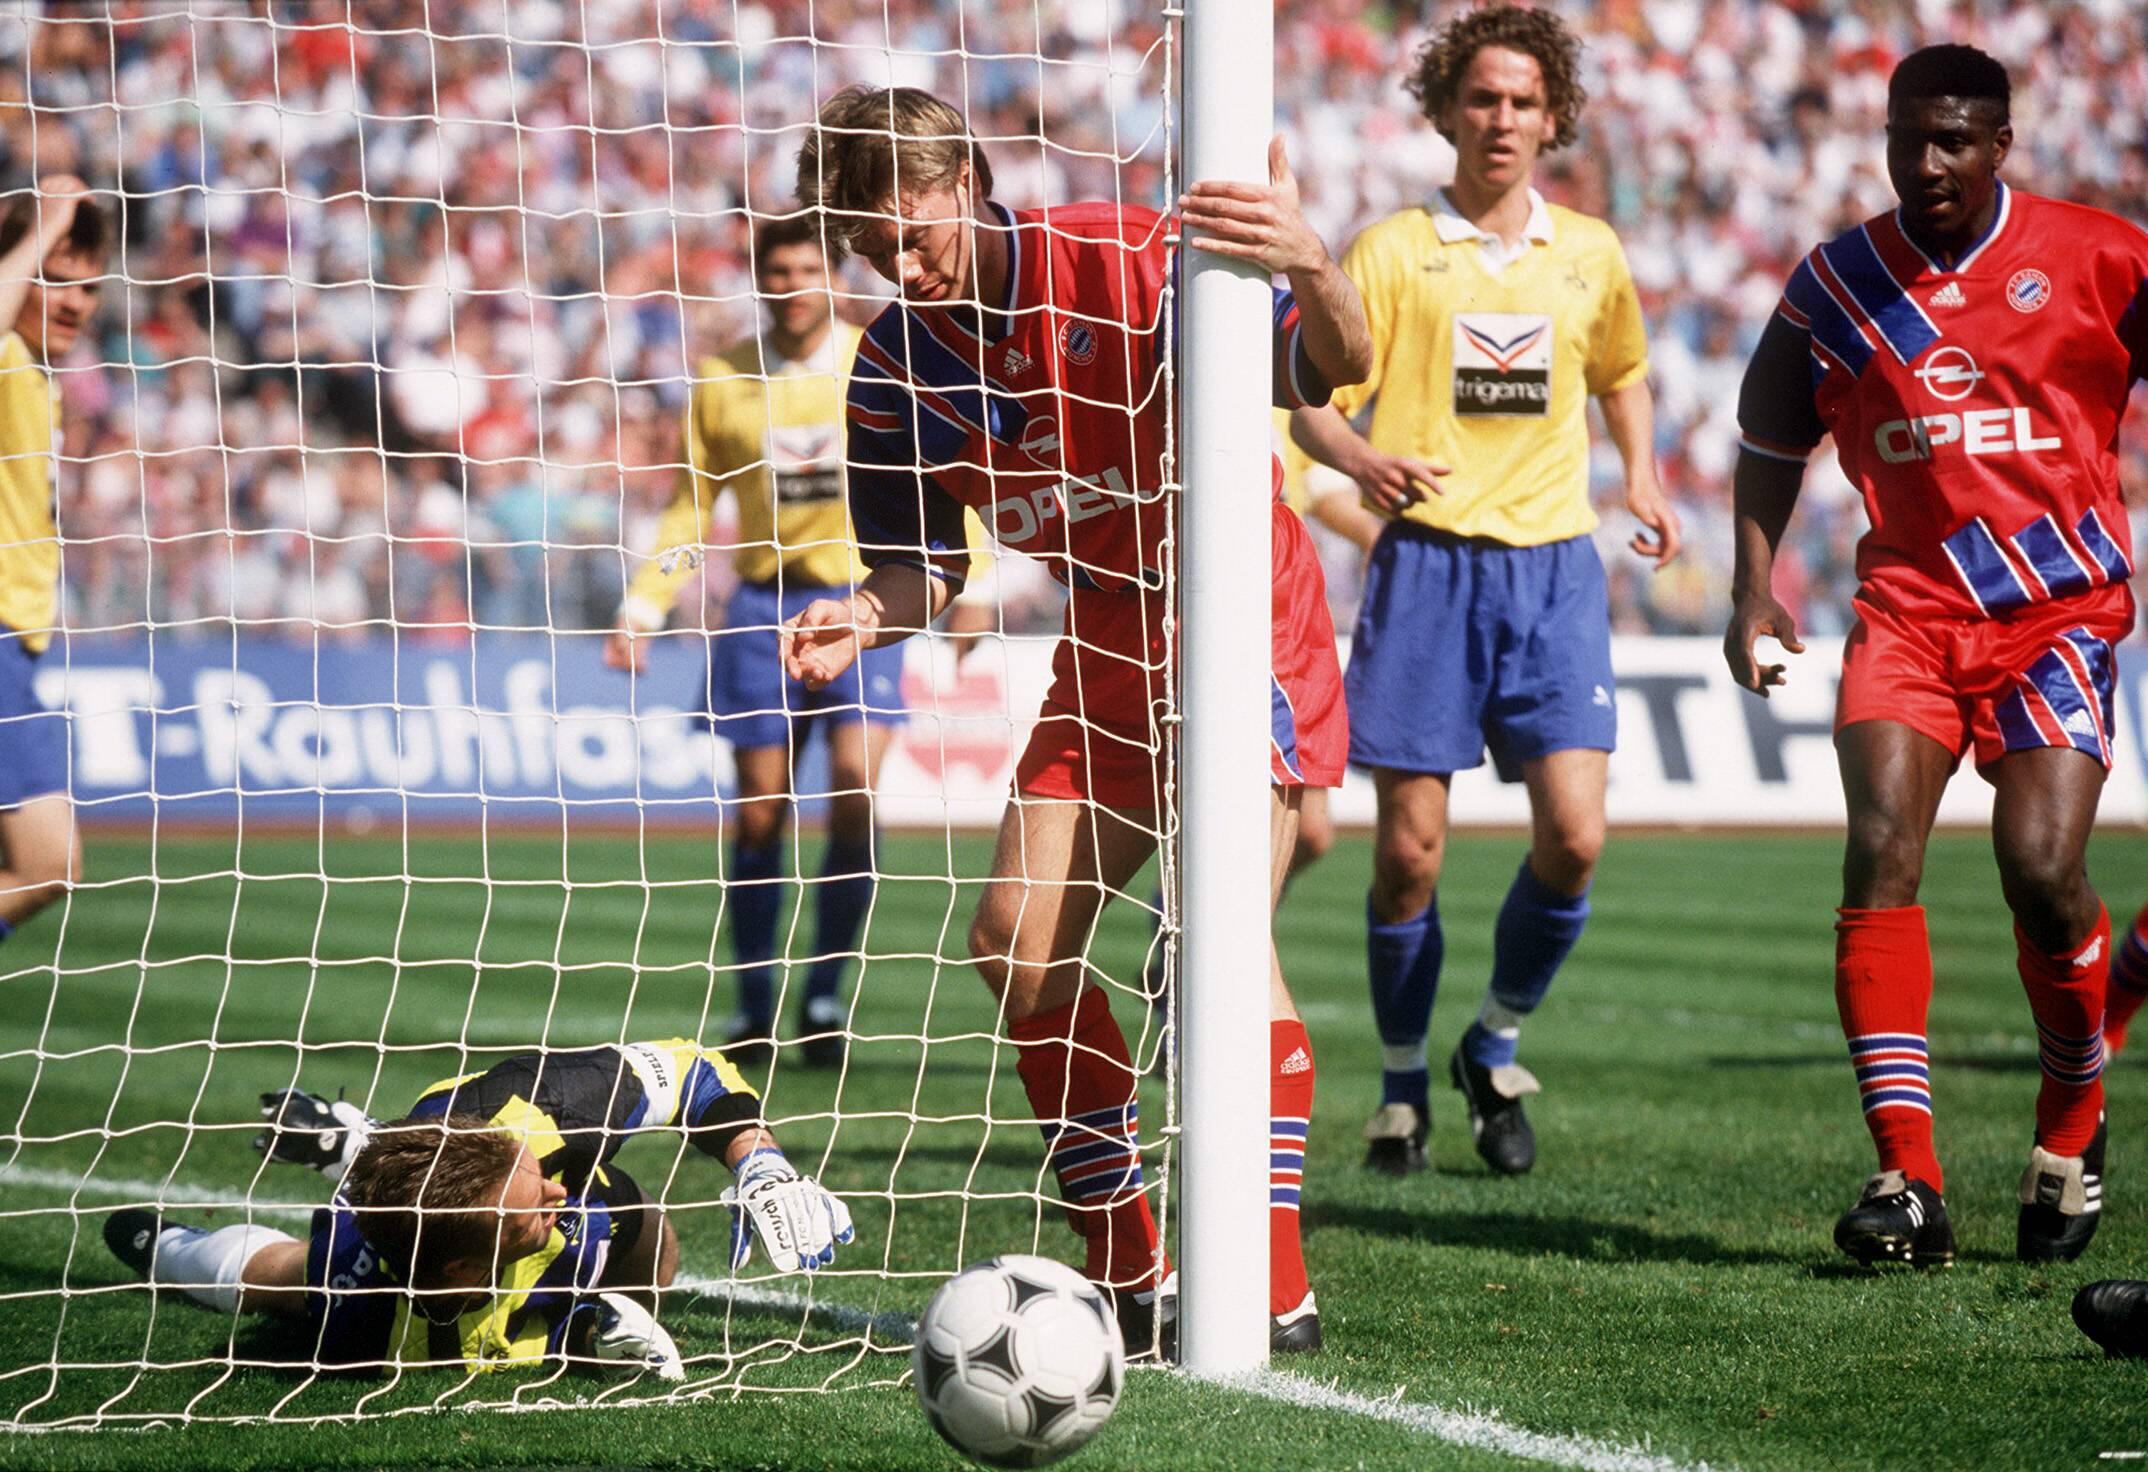 Bild zu Thomas Helmer, Tor, Bundesliga, Rekord, Fußball